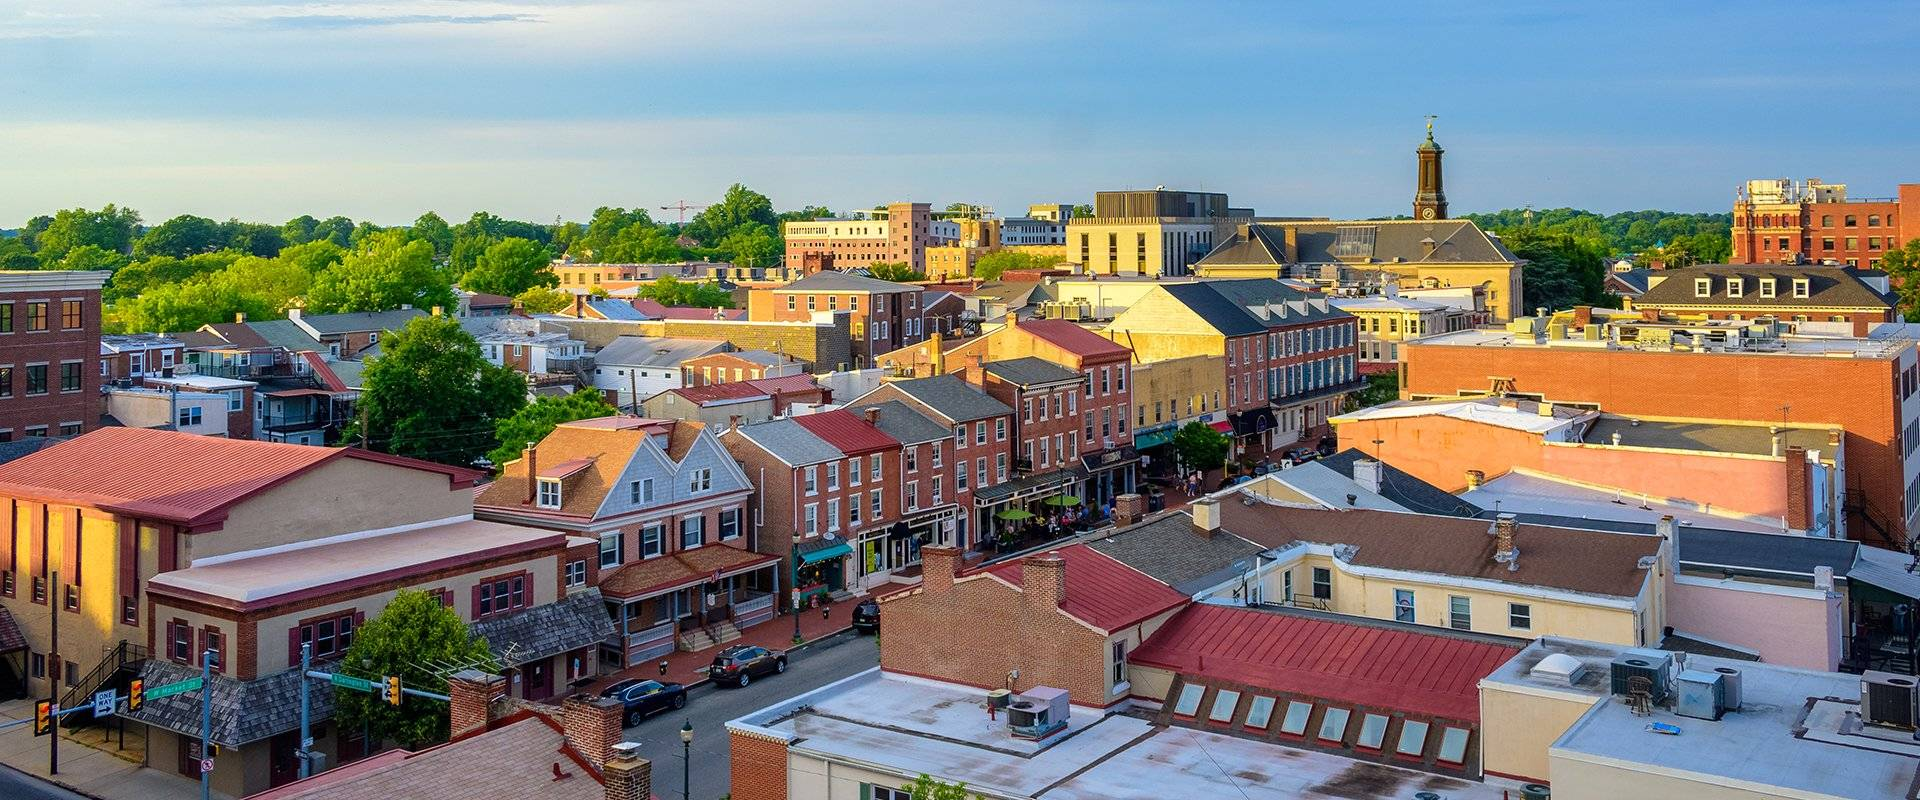 pennsylvania city skyline